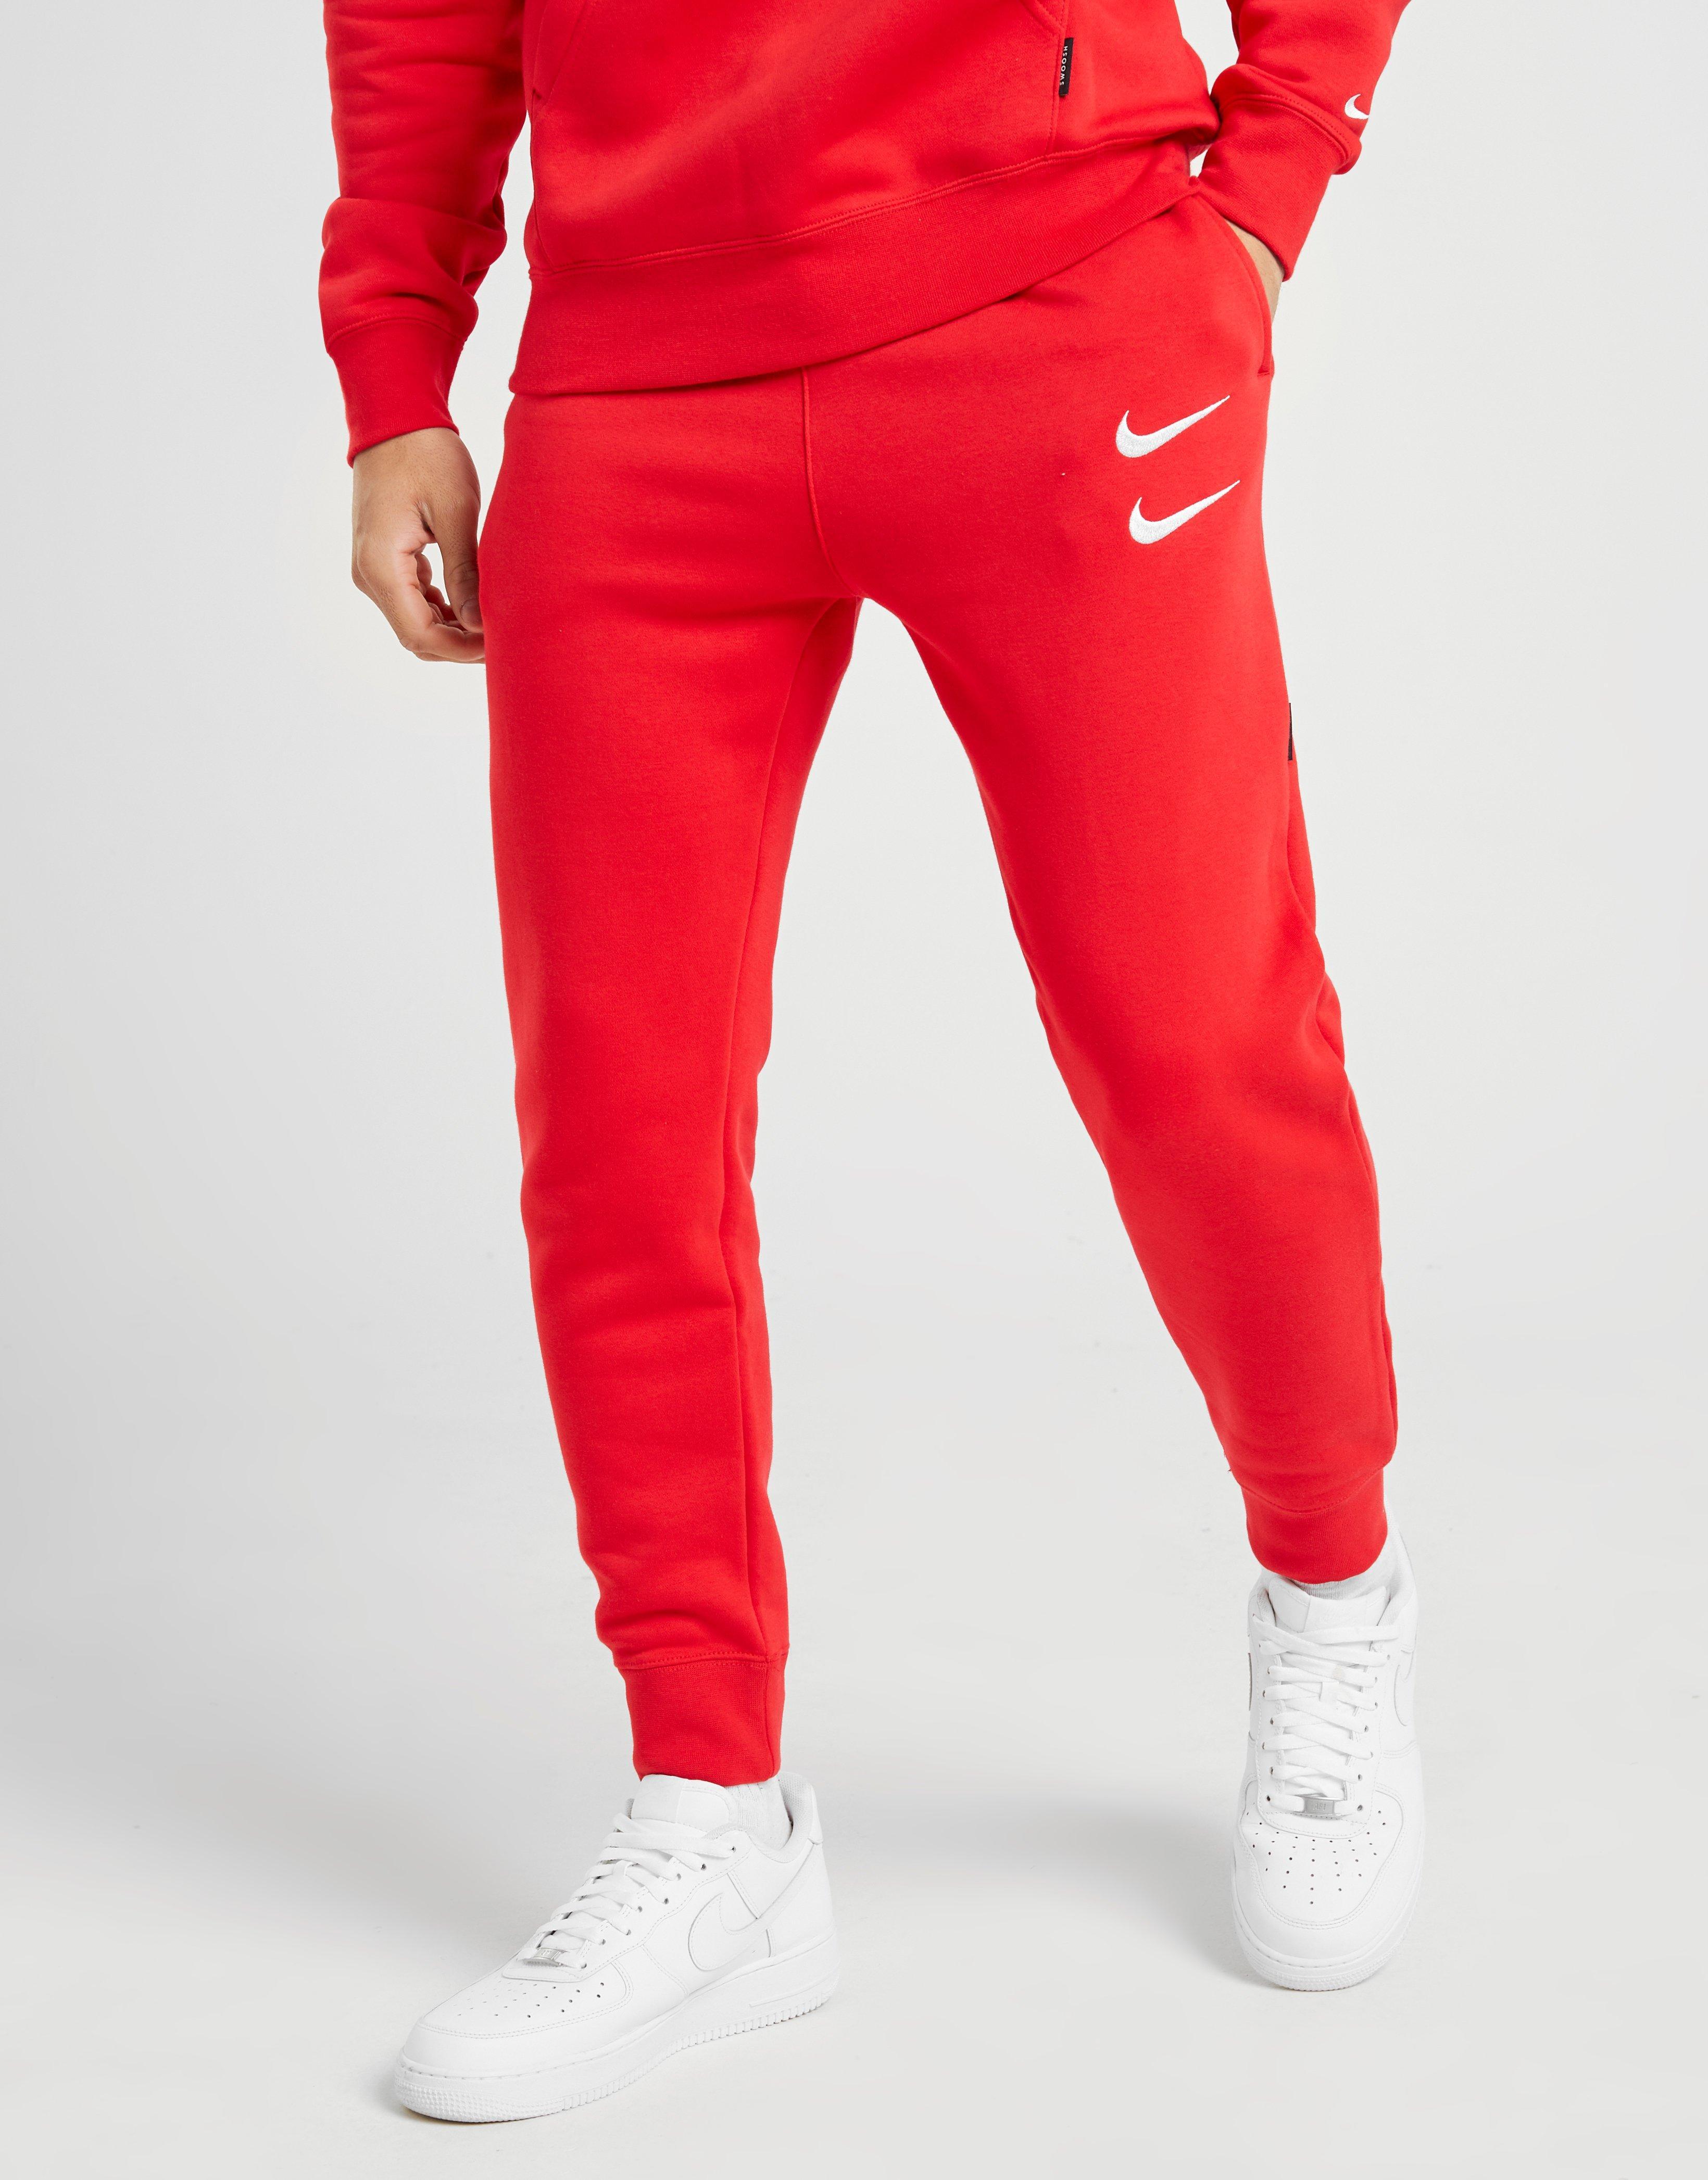 بعد ذلك شخصيا نهب Pantalones Rojos Hombre Nike Loudounhorseassociation Org